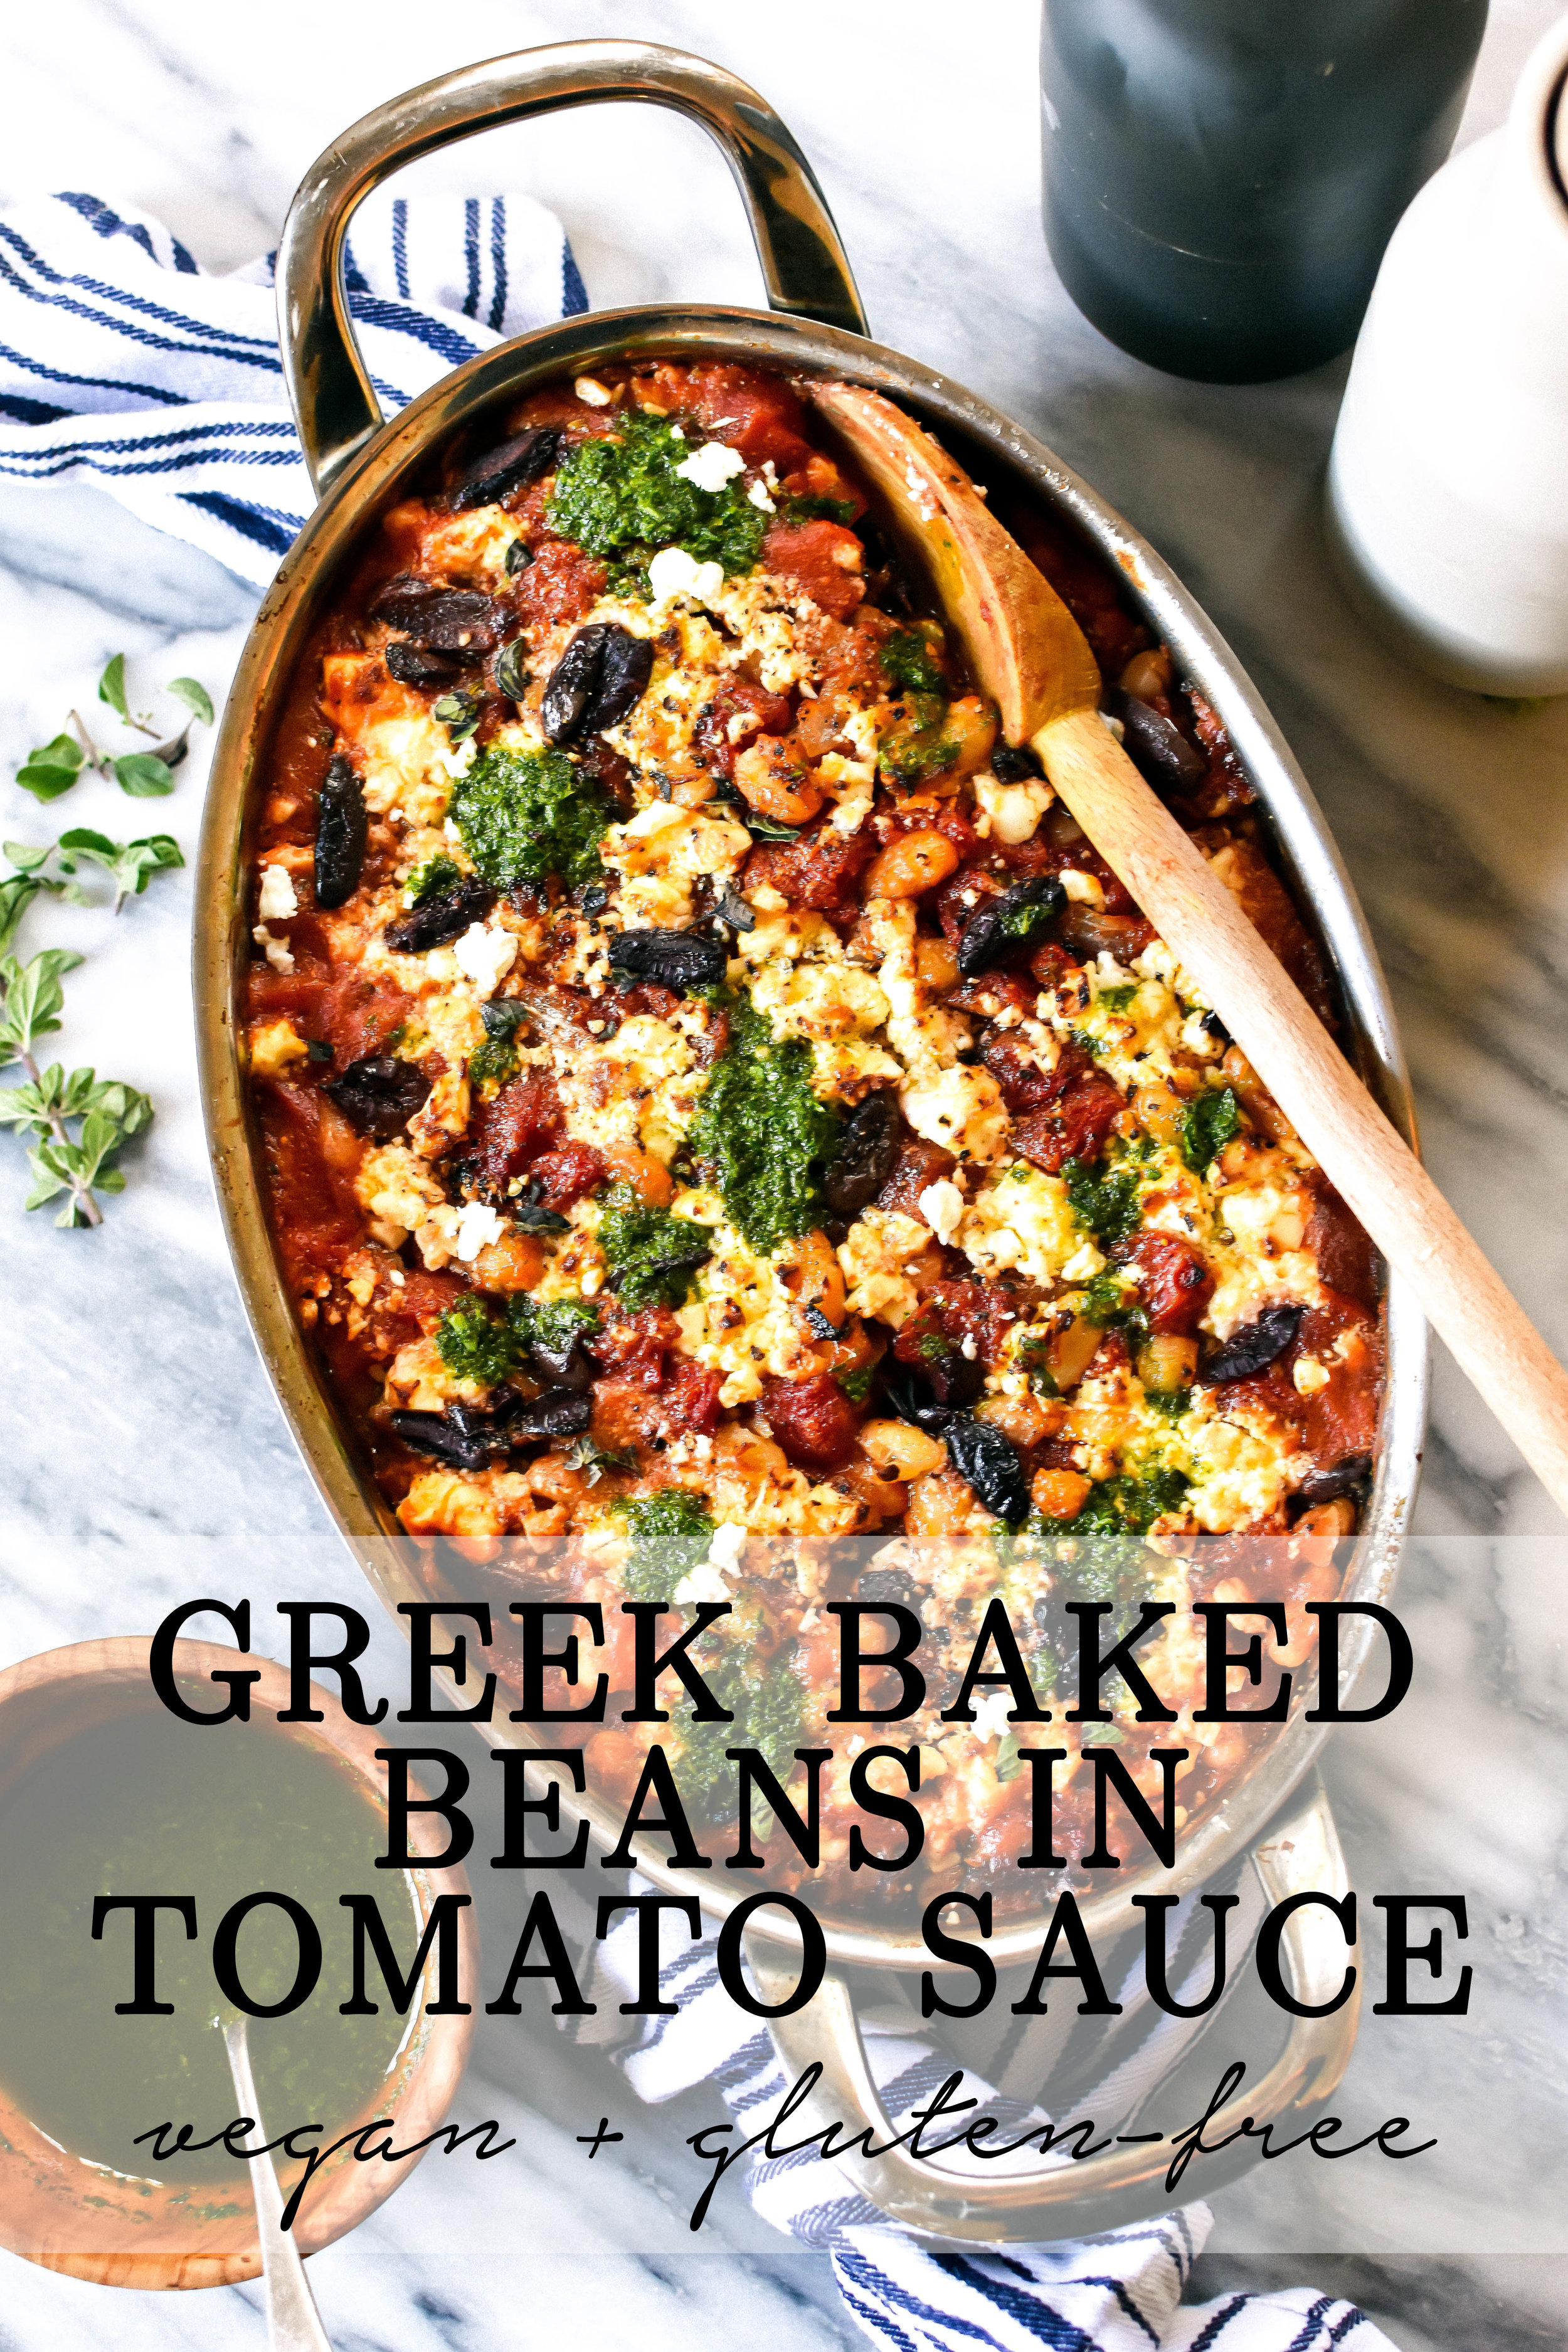 greek baked beans in tomato sauce